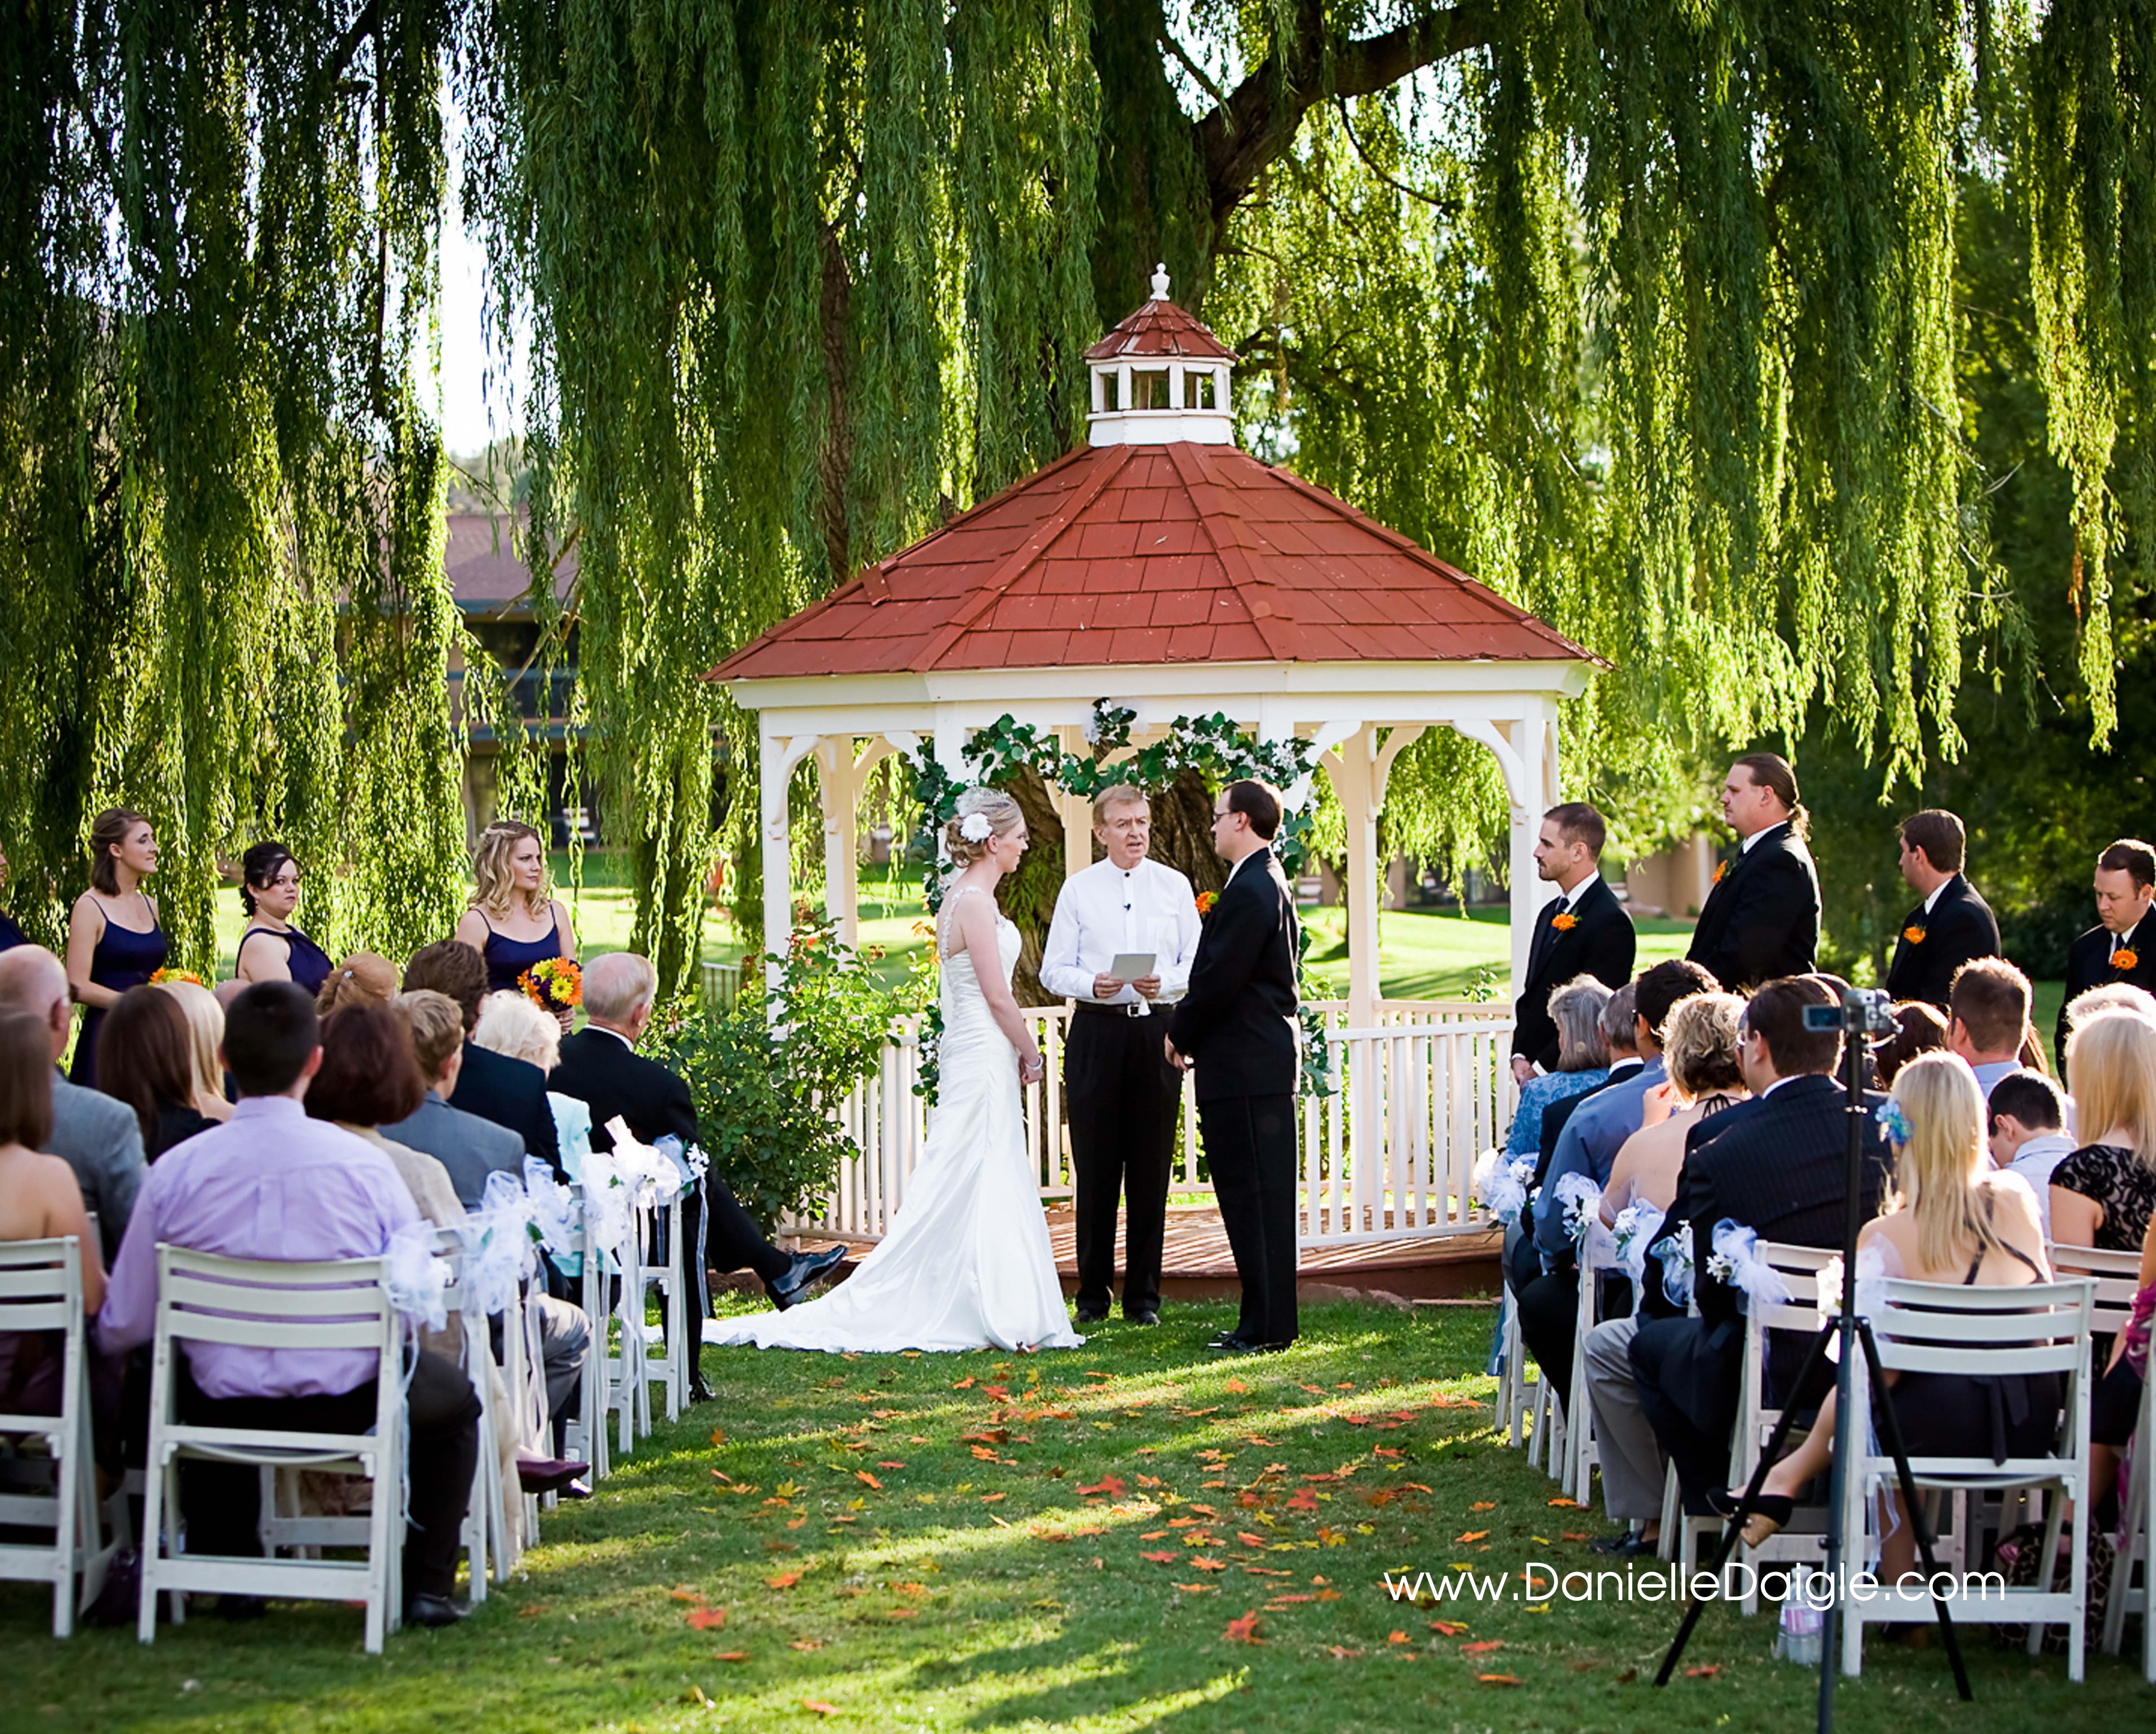 Weddings at poco diablo resort in sedona weddings at poco diablo danielle daigle photography junglespirit Image collections